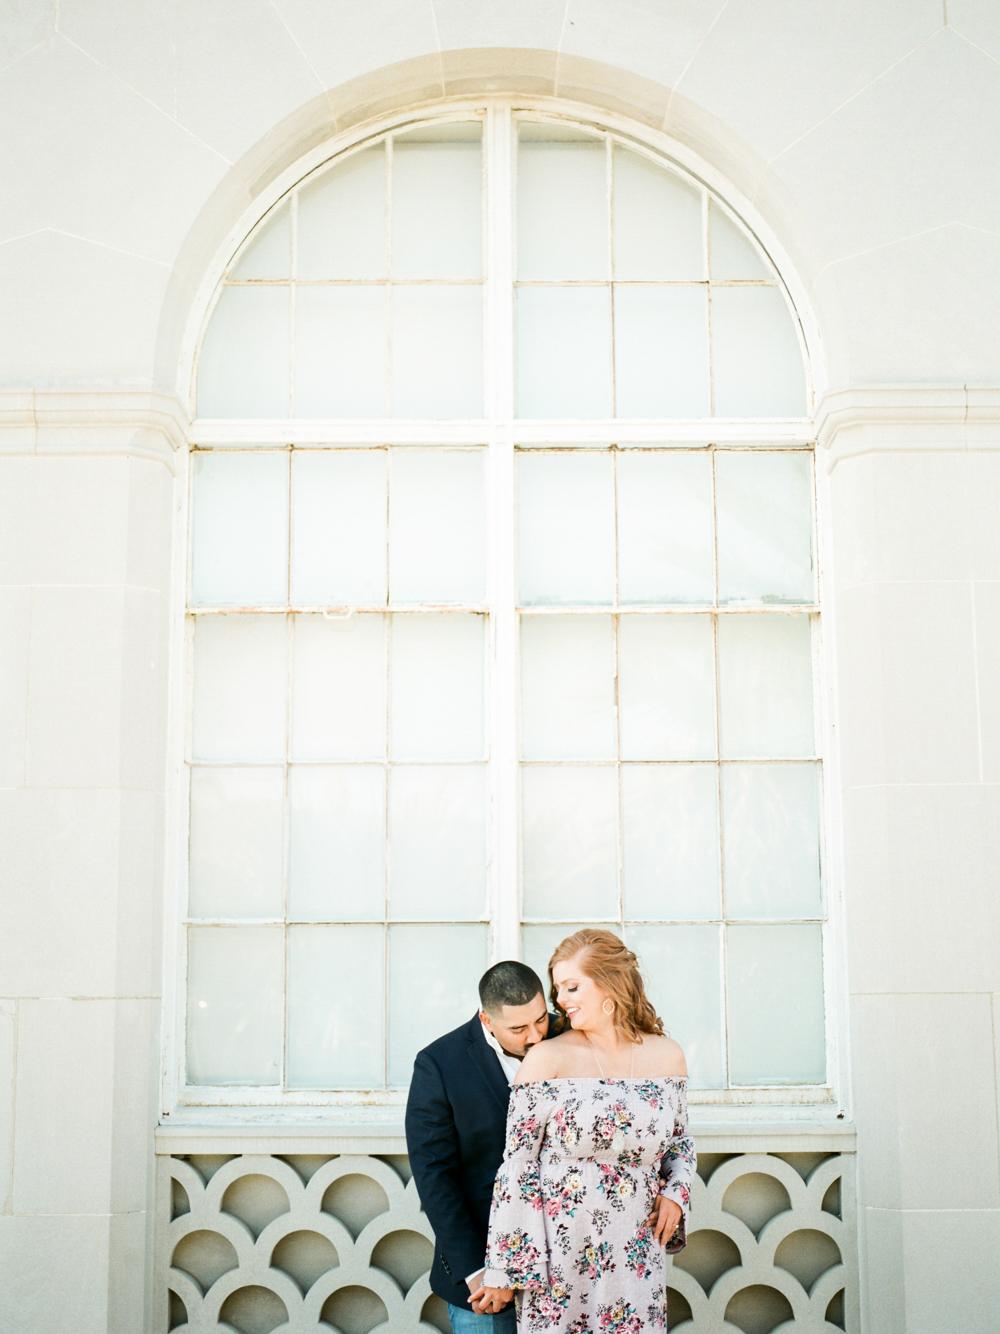 Christine Gosch - destination film photographer - houston wedding photographer - fine art film photographer - elopement photographer - destination wedding - understated wedding - simple beautiful wedding photography-109.jpg